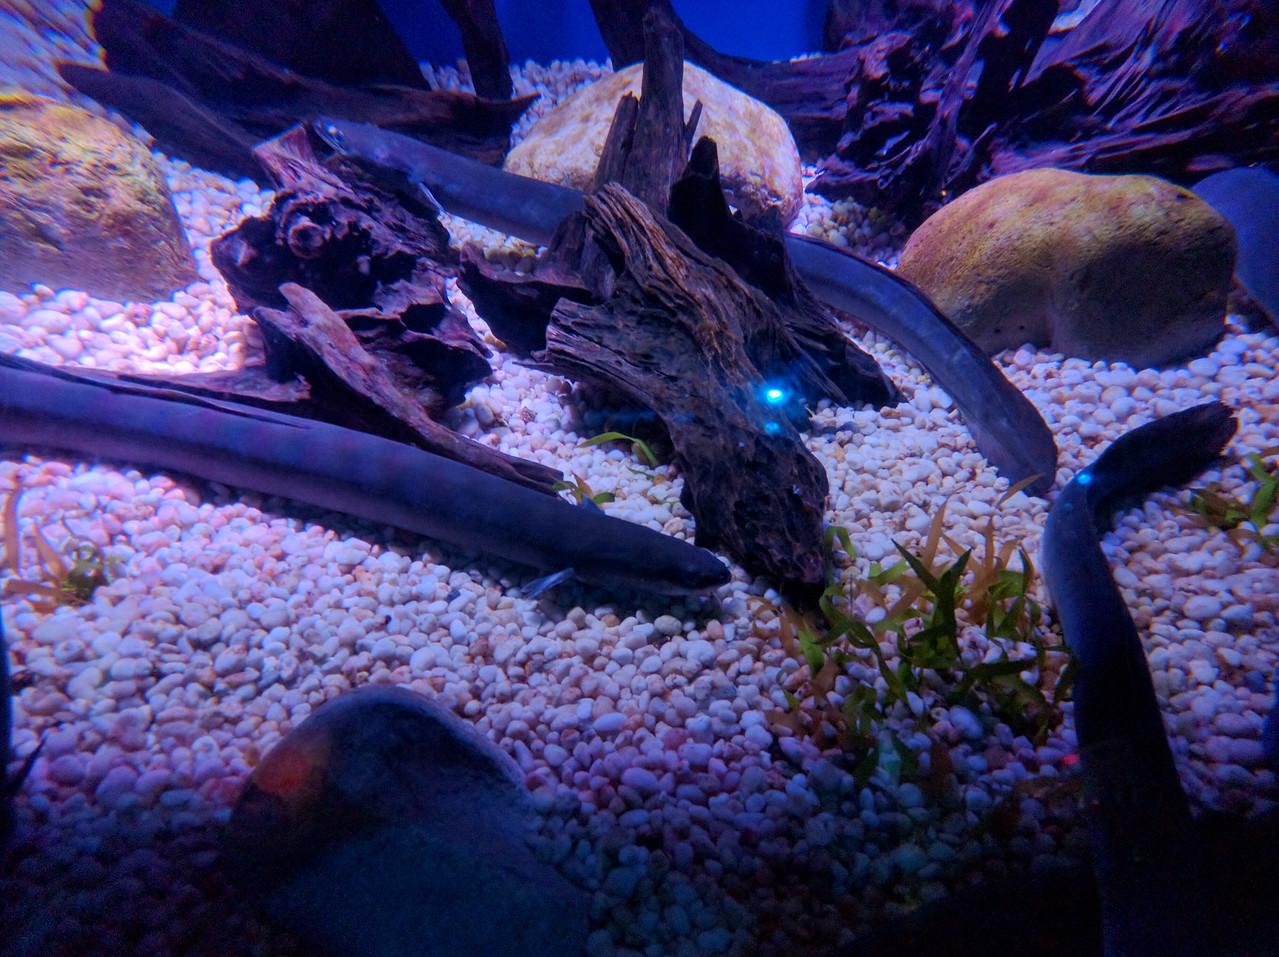 030 - Toronto - Aquarium - Wolf Eels